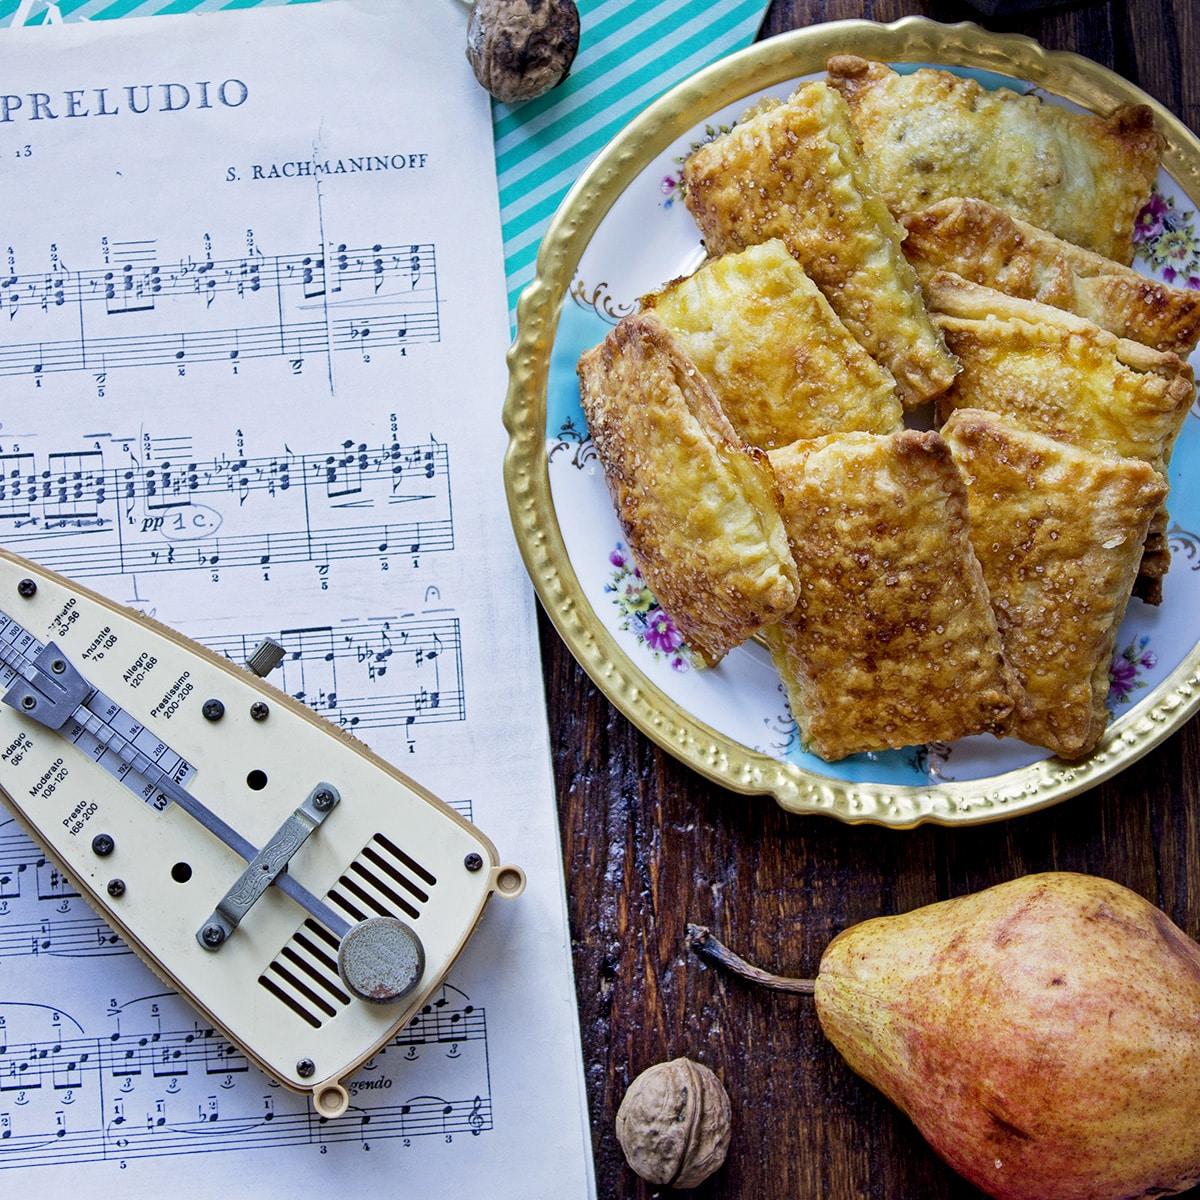 biscotti-petit-beurre-alla-marmellata-di-mele-noci-cognac-1-contemporaneo-food